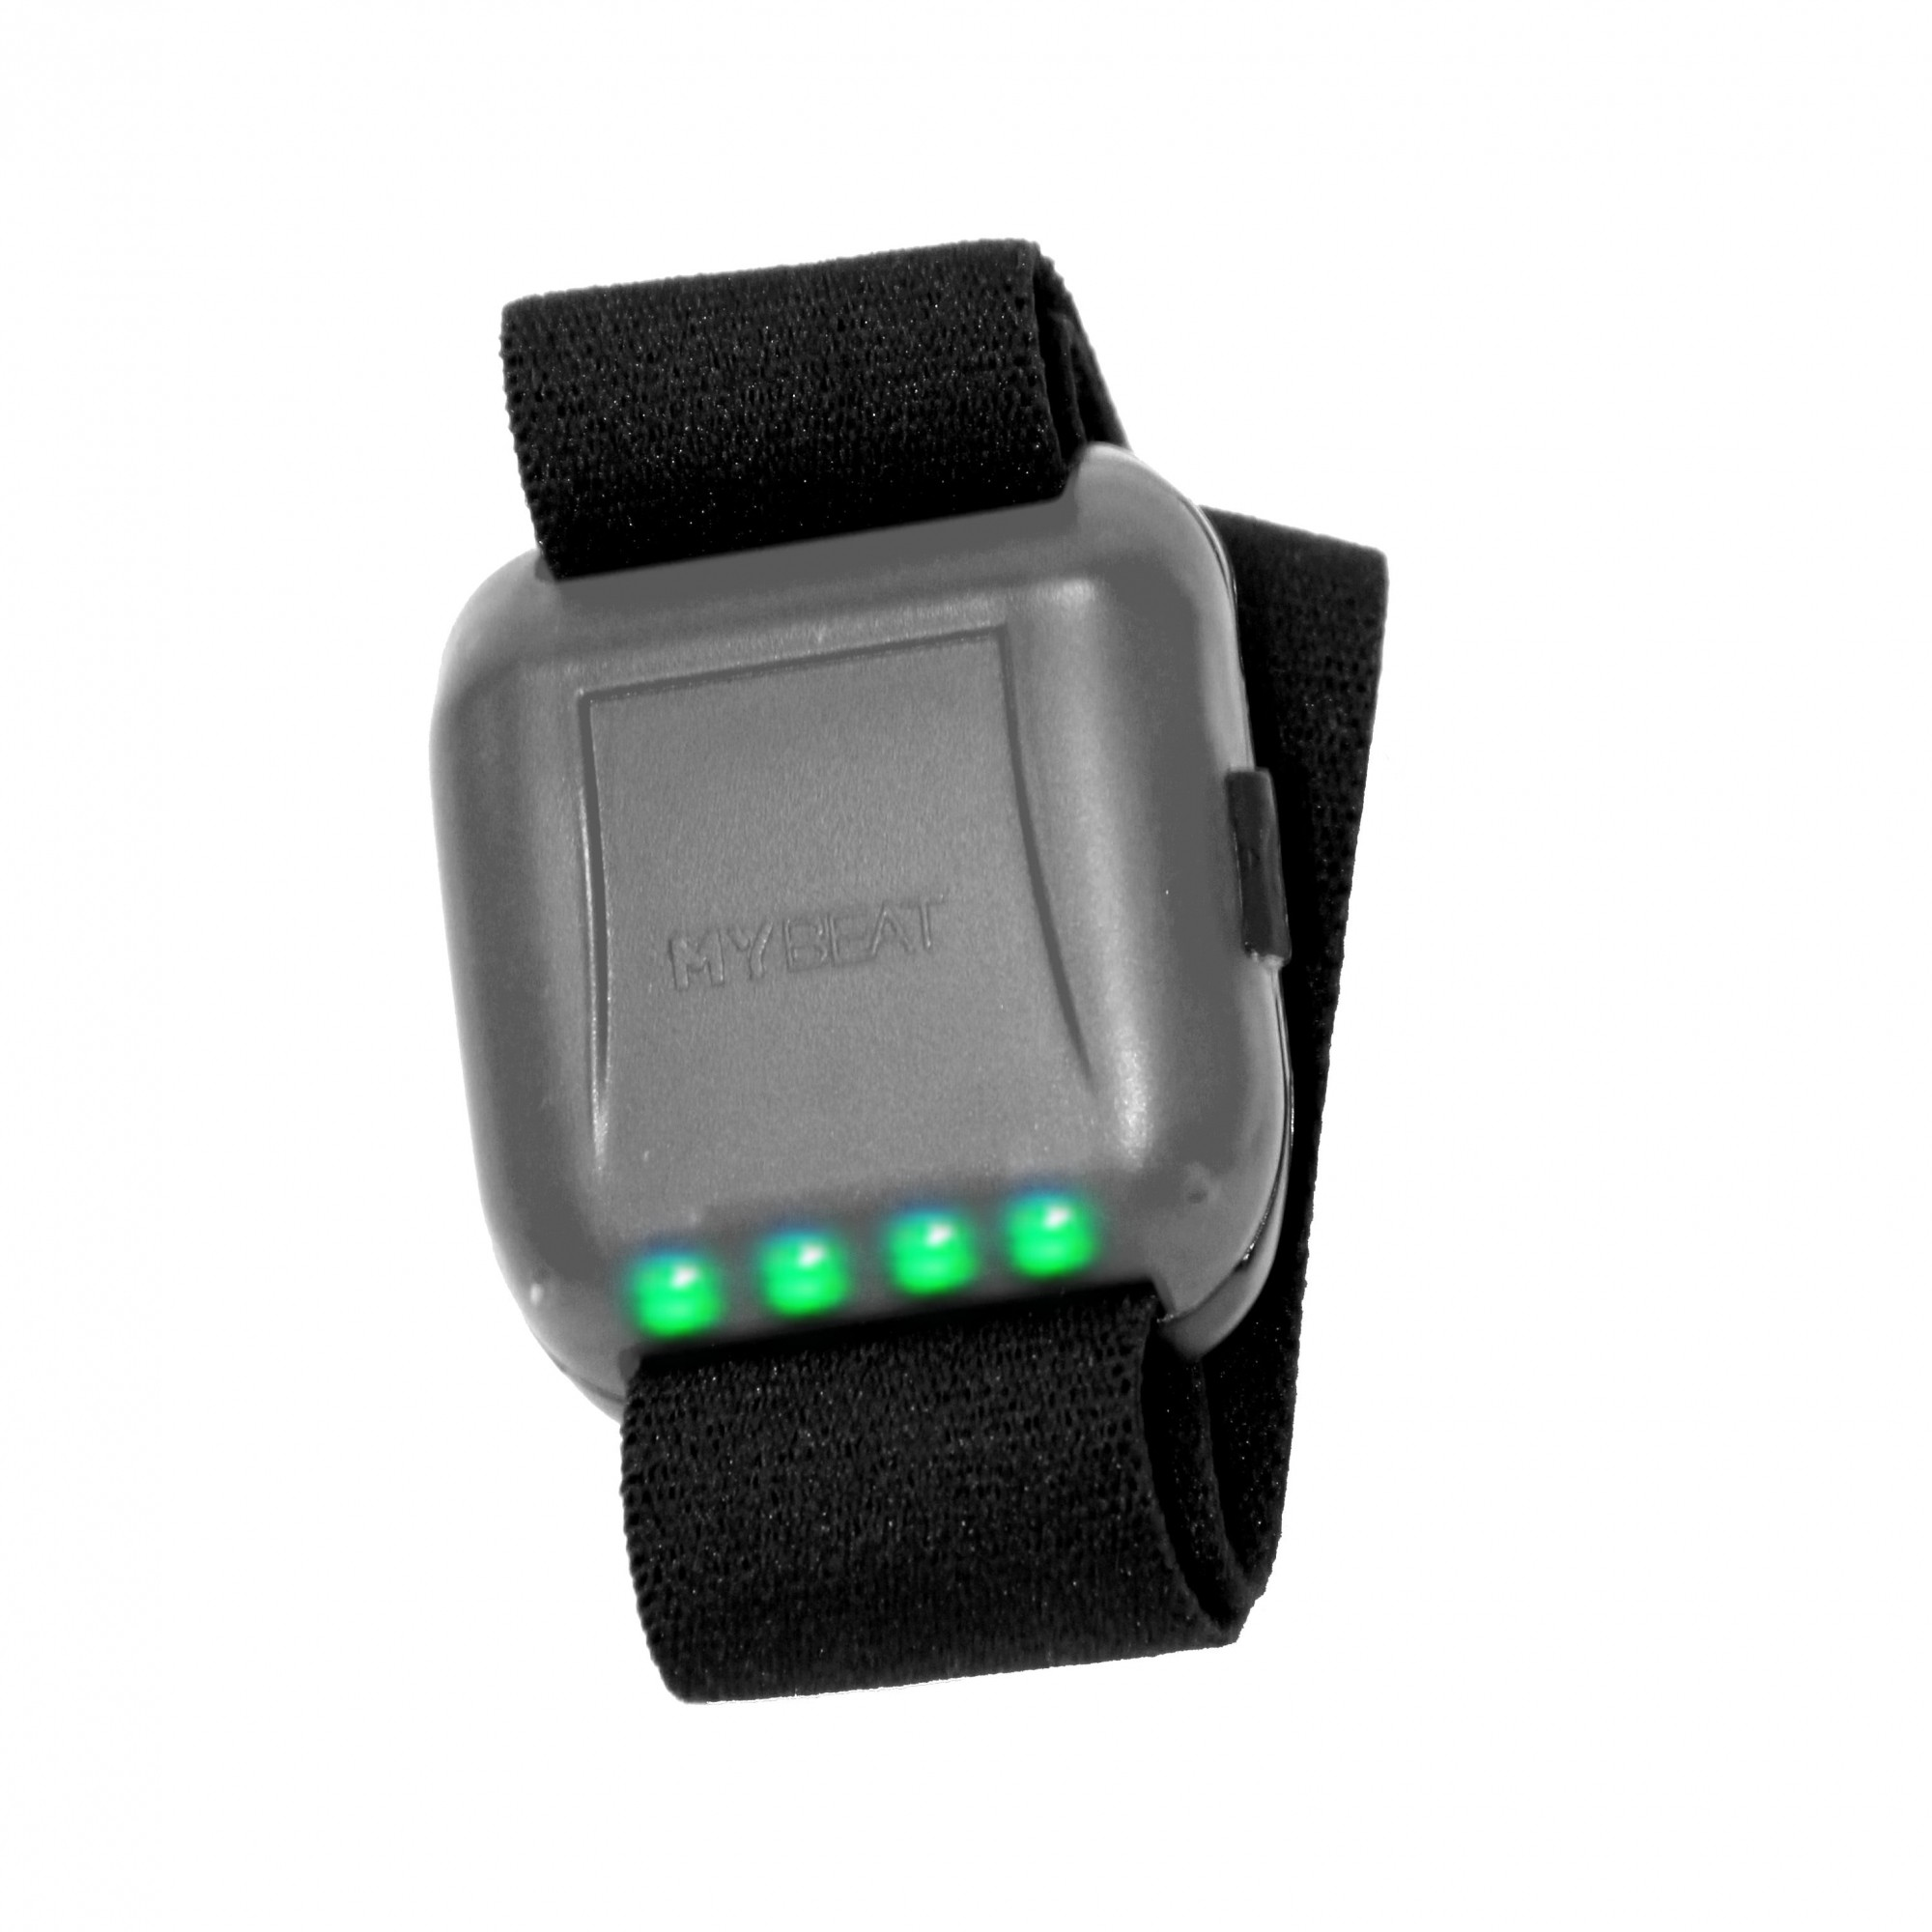 Monitor de Frequência Cardíaca - Bracelete MyBeat 2.0 - Rae Fitness